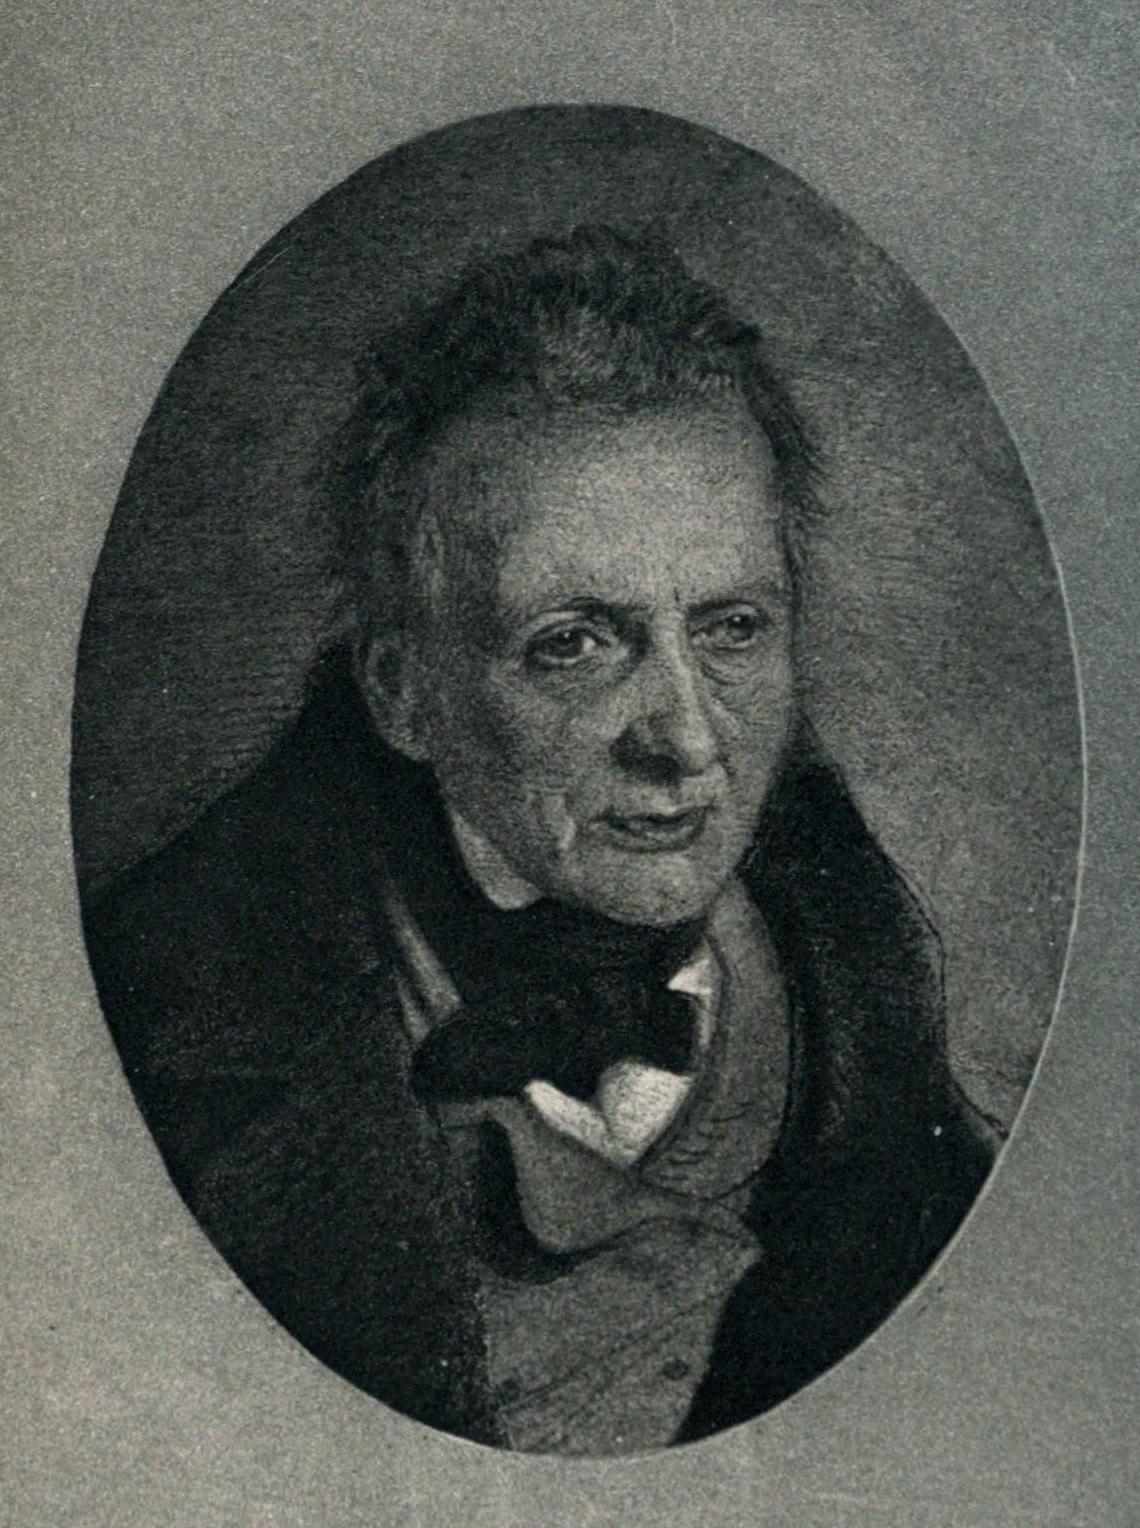 Thomas De Quincey bibliography - Wikipedia